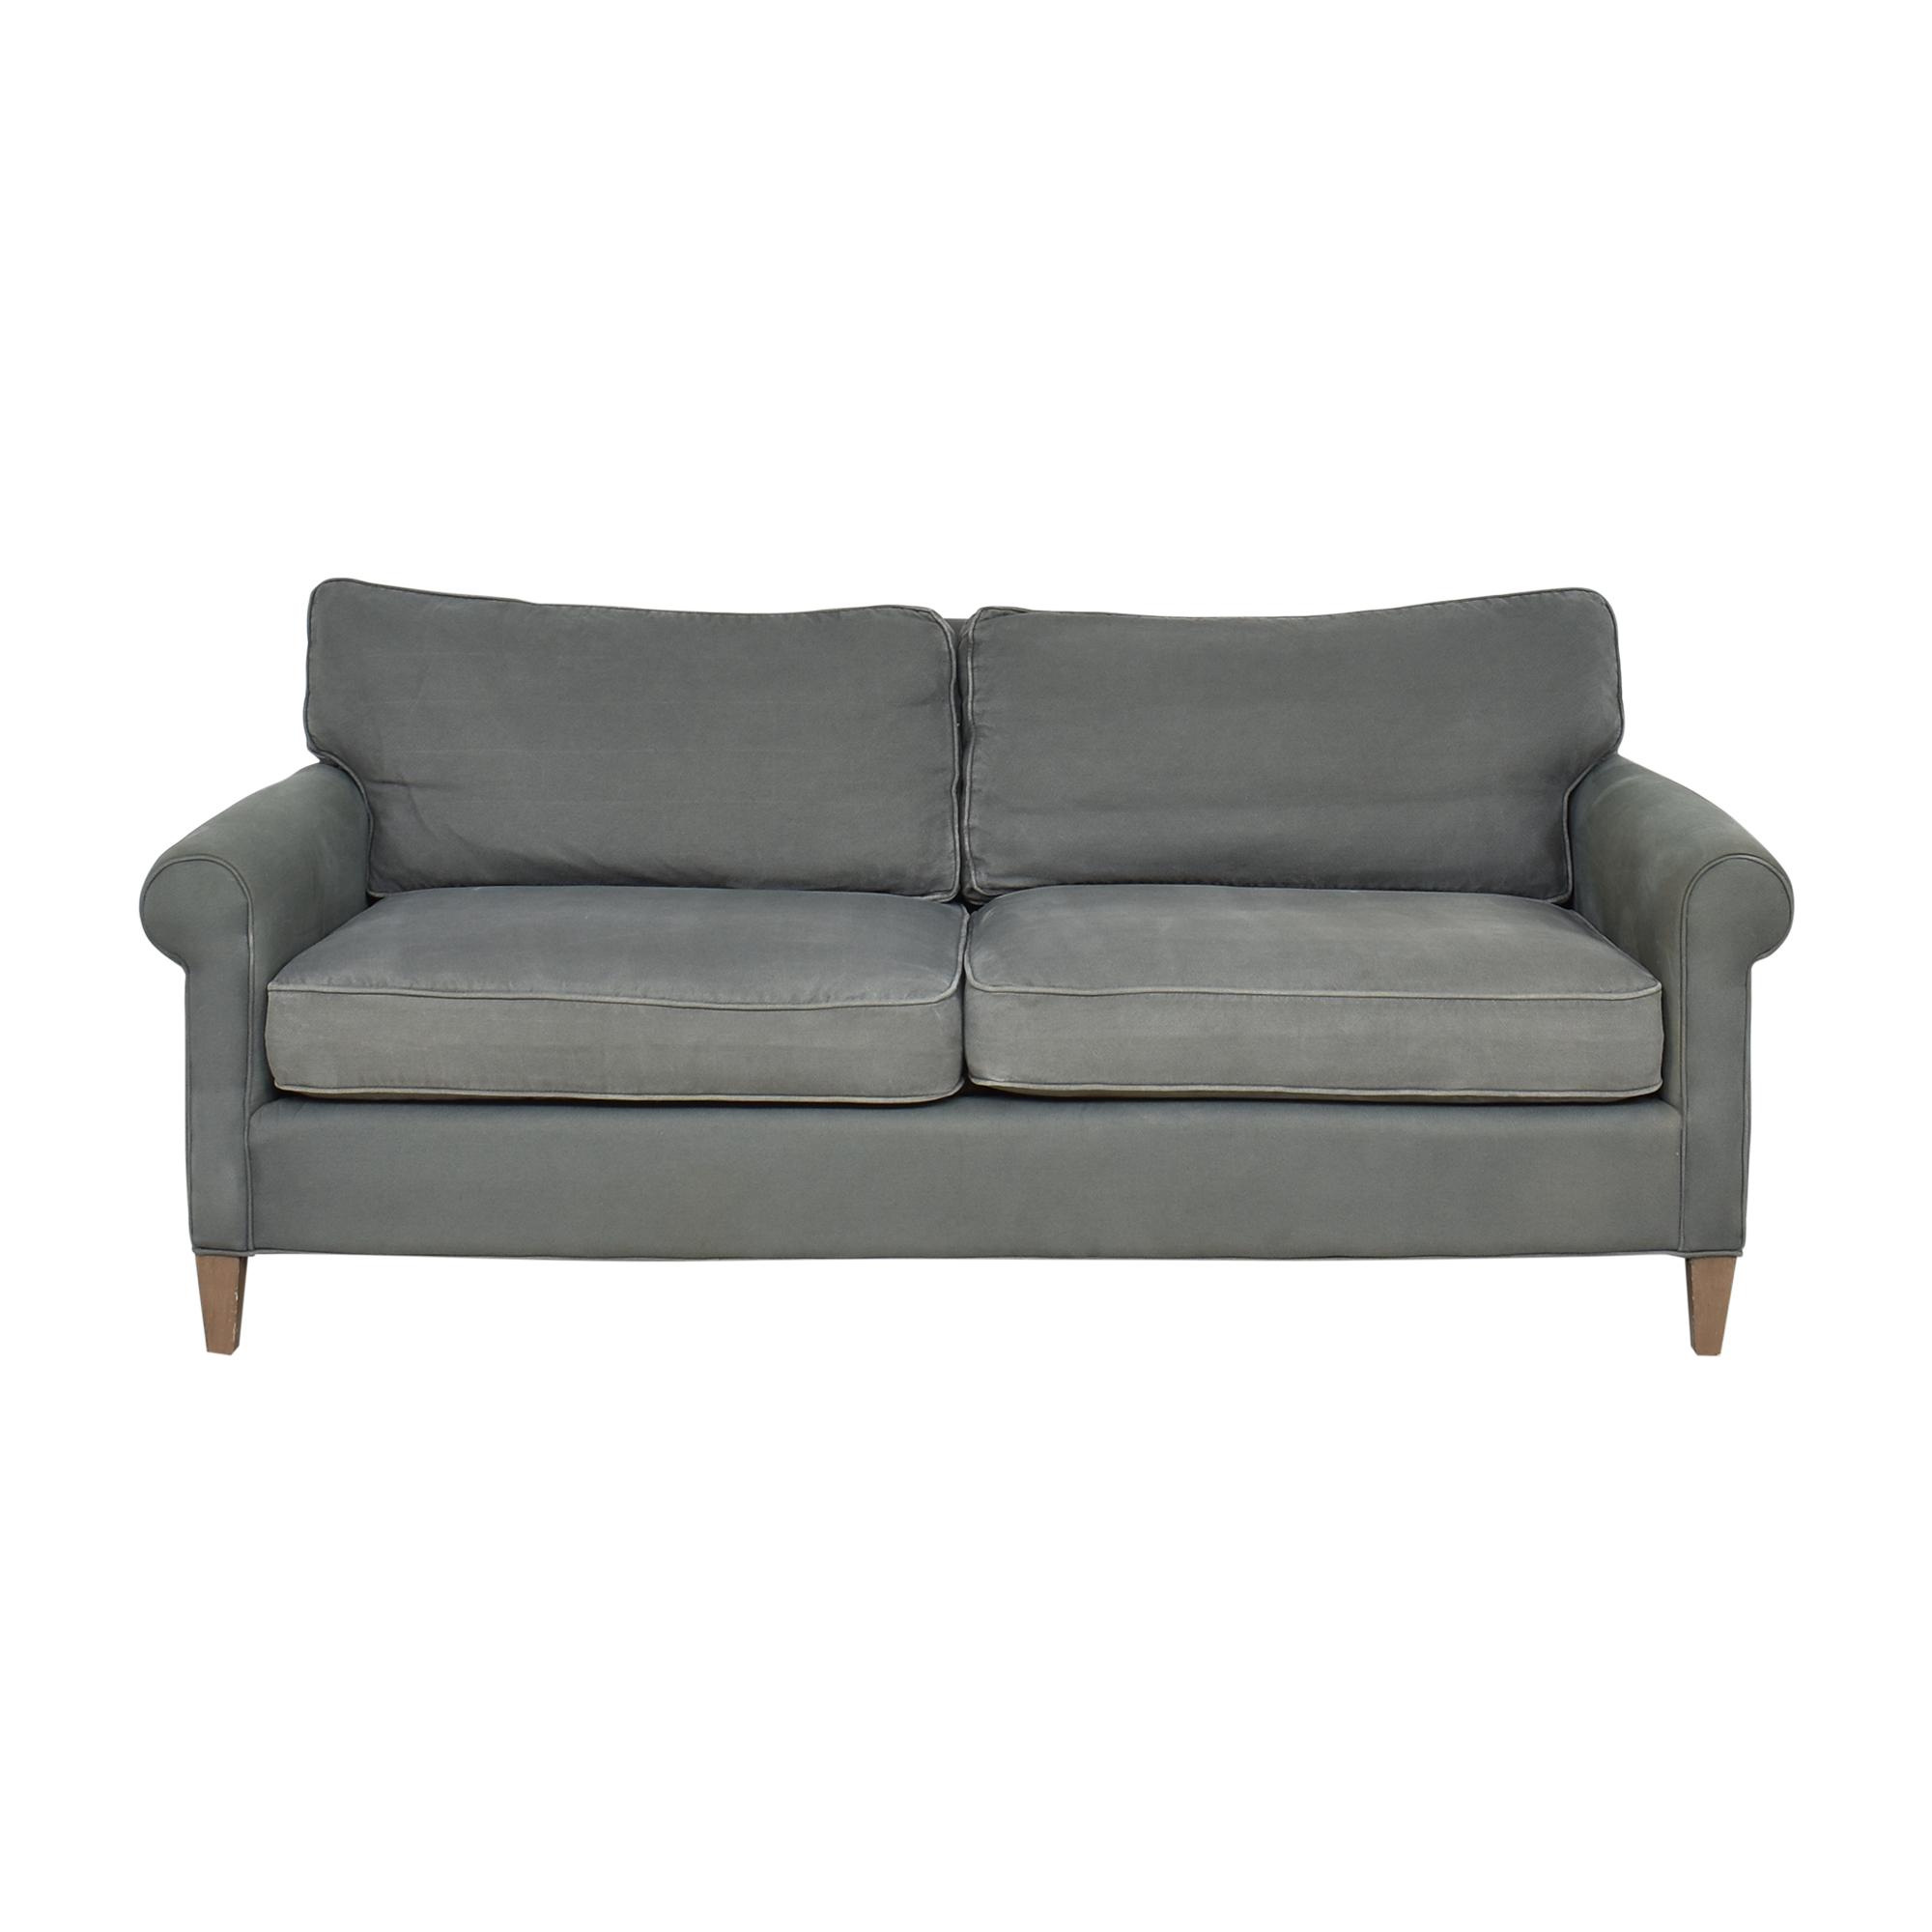 Crate & Barrel Roll Arm Sofa / Classic Sofas